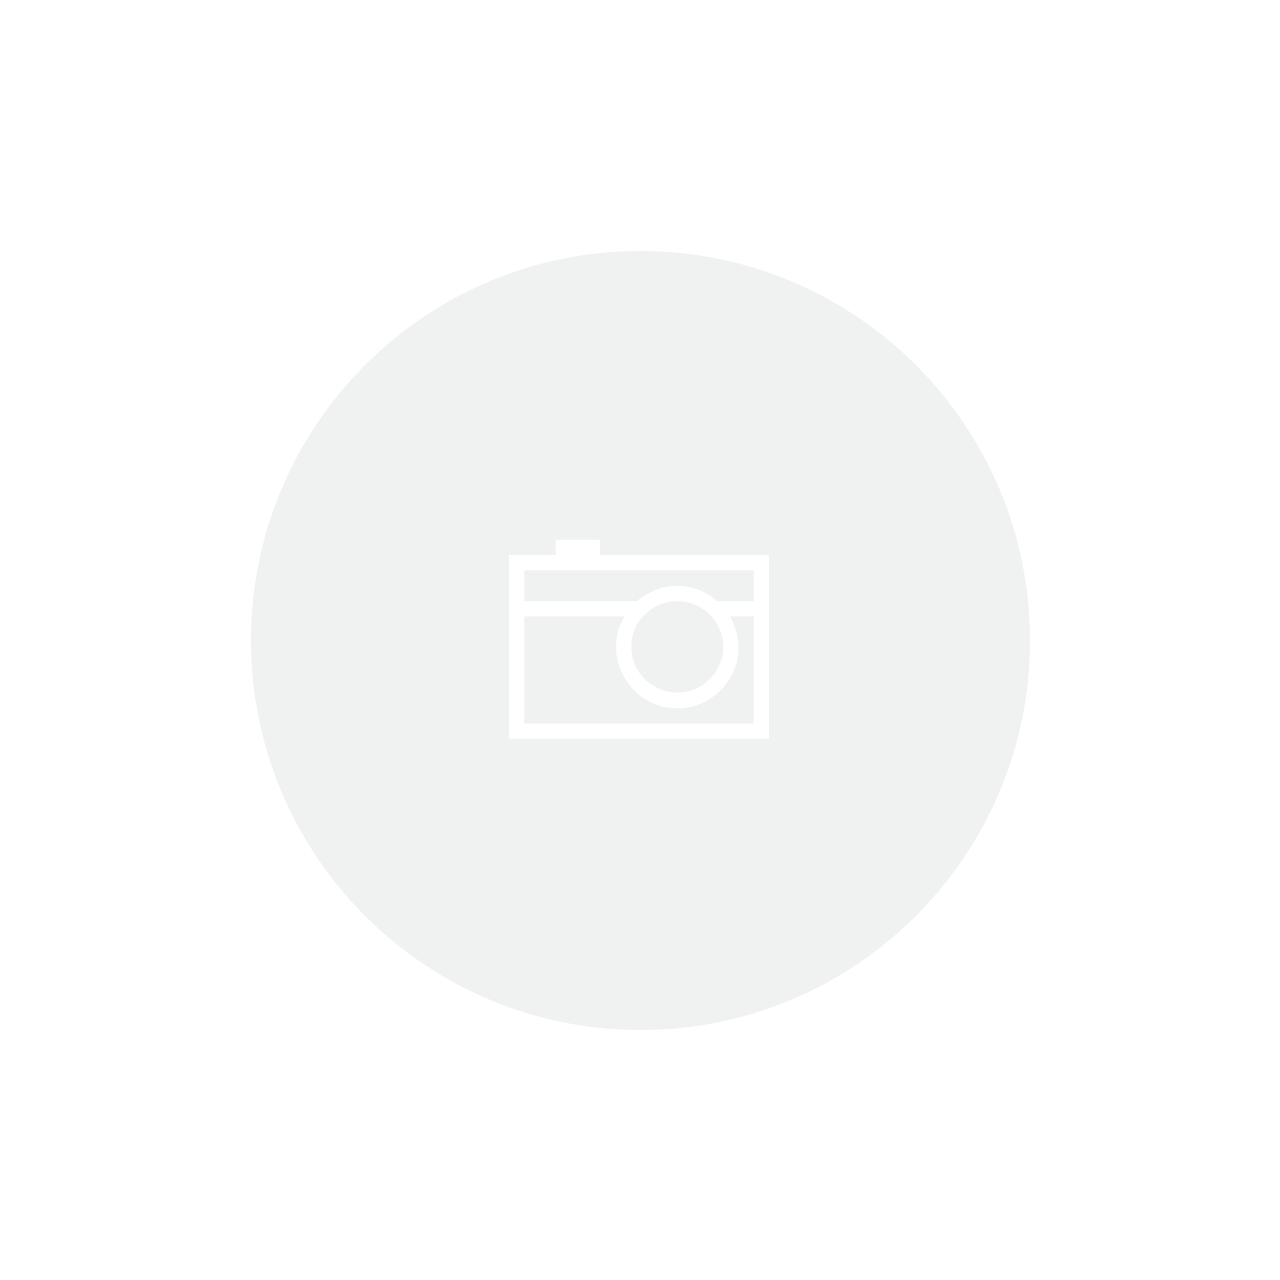 PNEU 29X2.10 CHAOYANG VICTORY H-5129 BANDA LEVE (PAR)